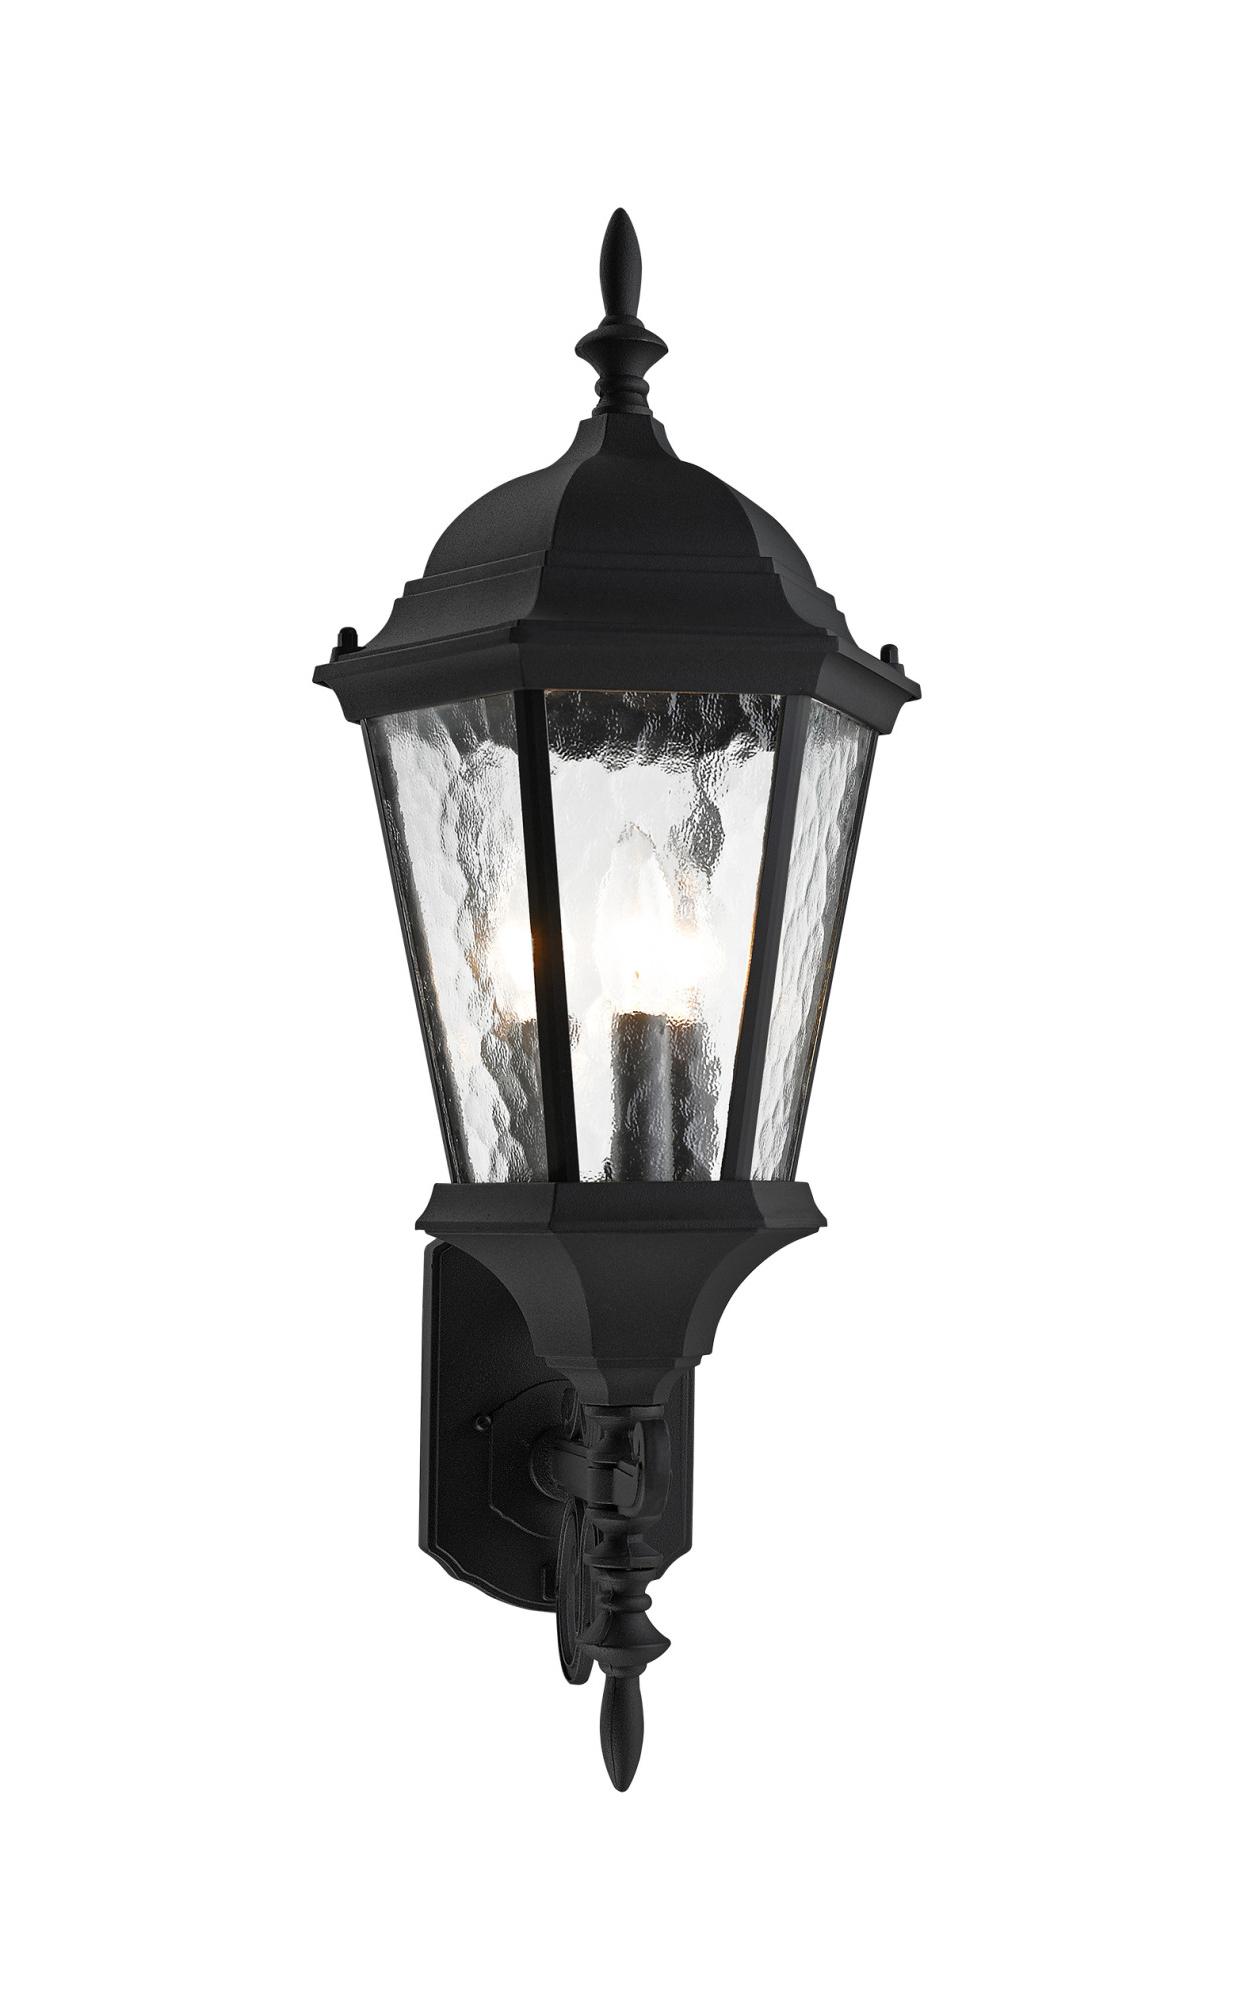 Roden Black 3 Bulb Outdoor Wall Lanterns Regarding Trendy Livex Lighting 75467 Black Hamilton 3 Light Outdoor Wall (View 17 of 20)